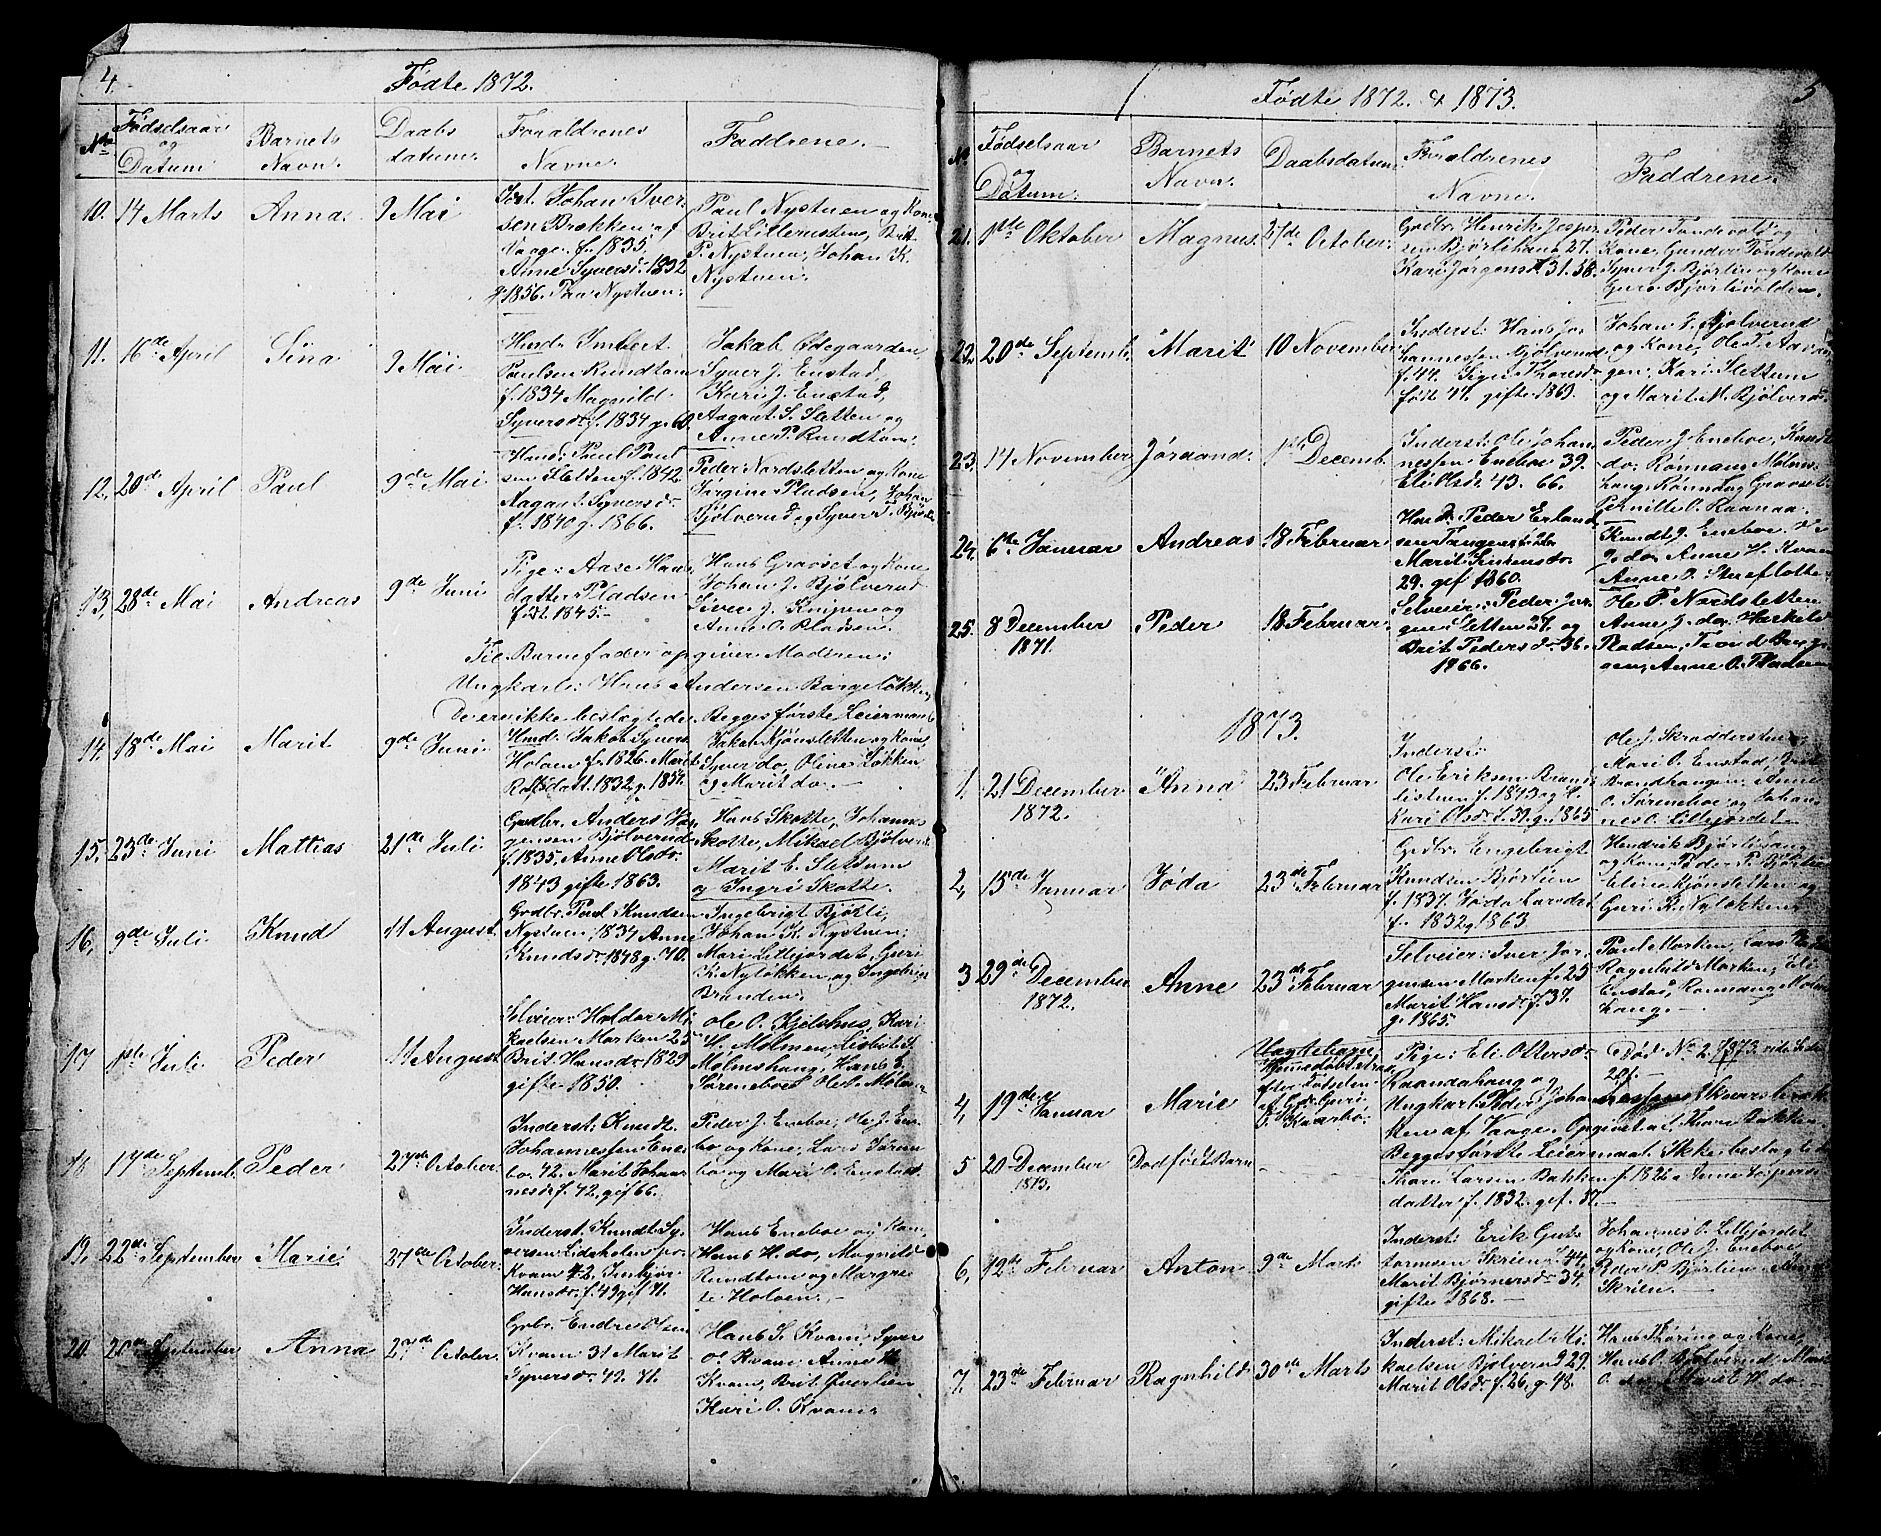 SAH, Lesja prestekontor, Klokkerbok nr. 6, 1871-1904, s. 4-5